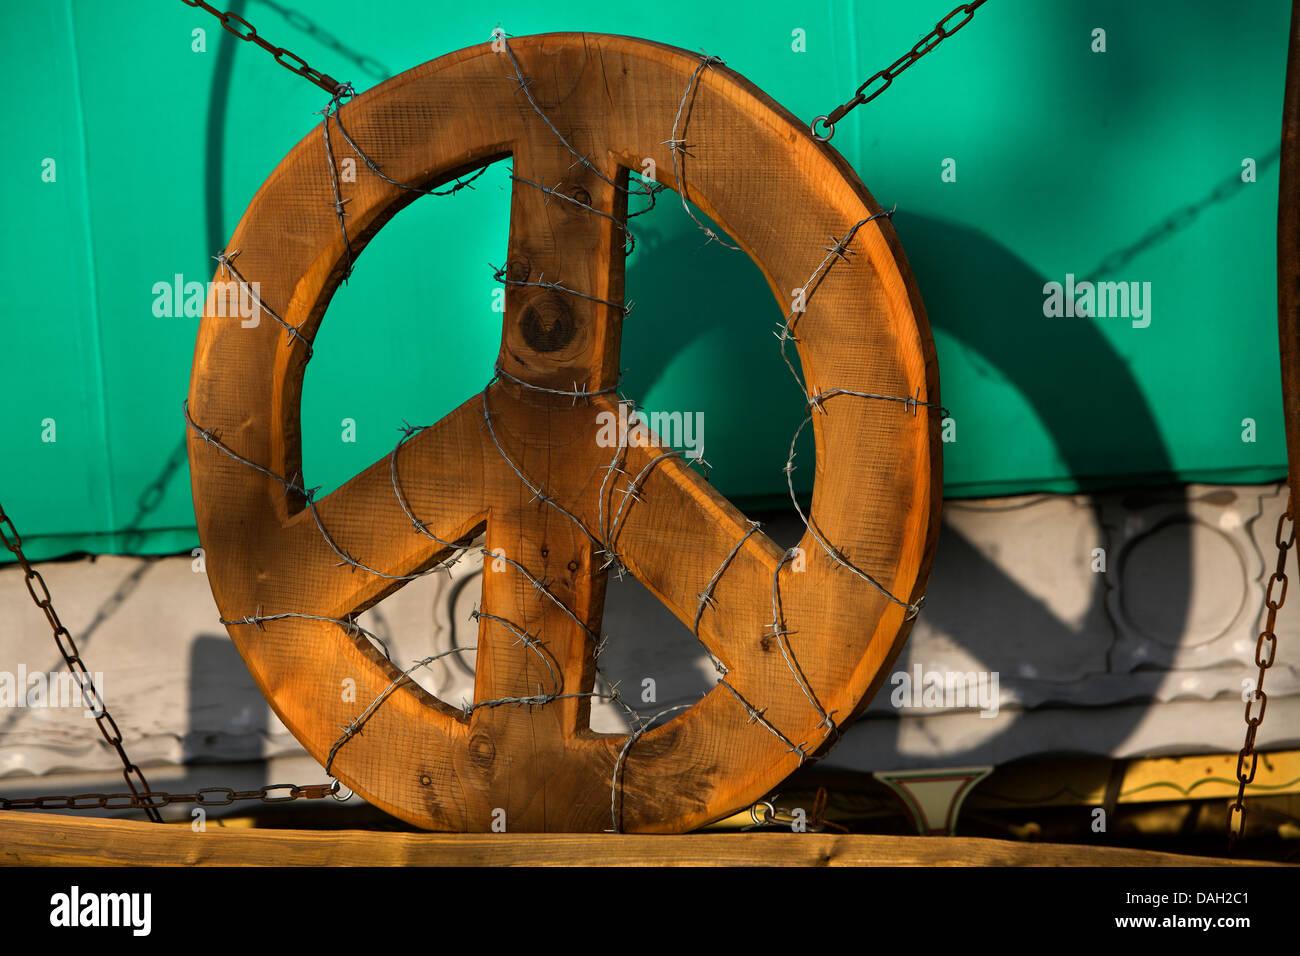 Symbole de la CND au festival de Glastonbury, Royaume-Uni Photo Stock